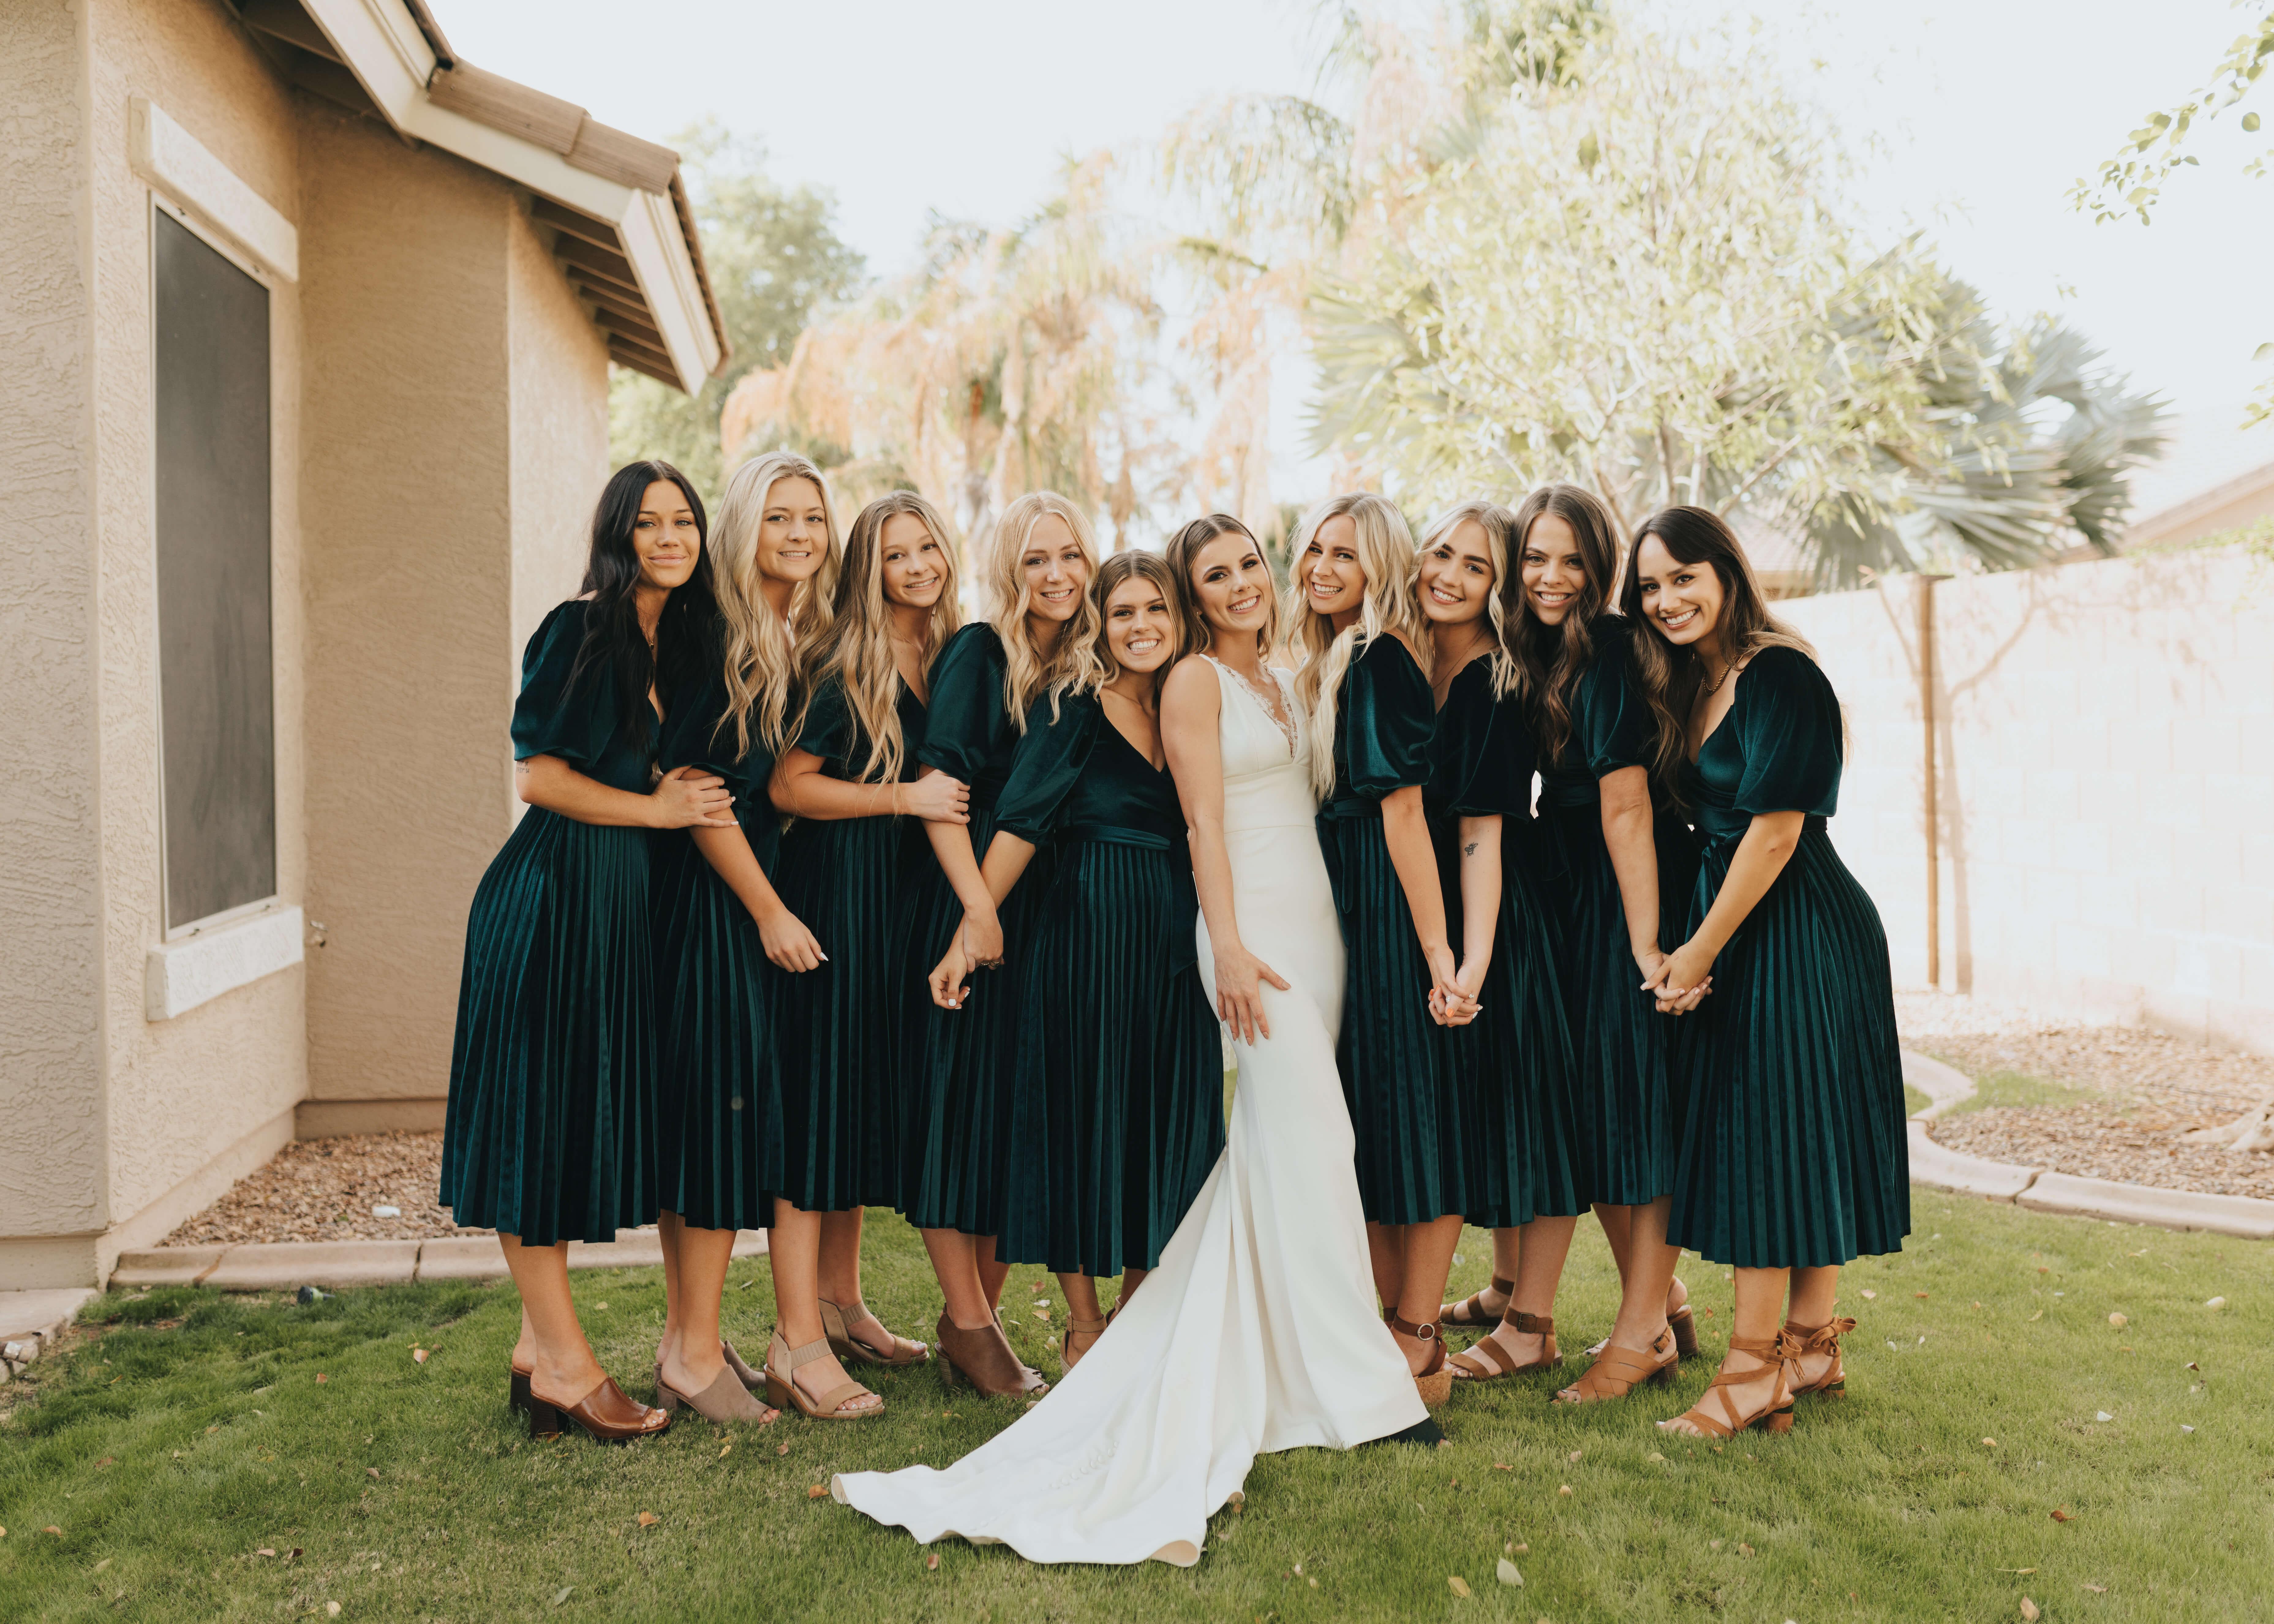 emerald green bridesmaid dress idea with bride photo